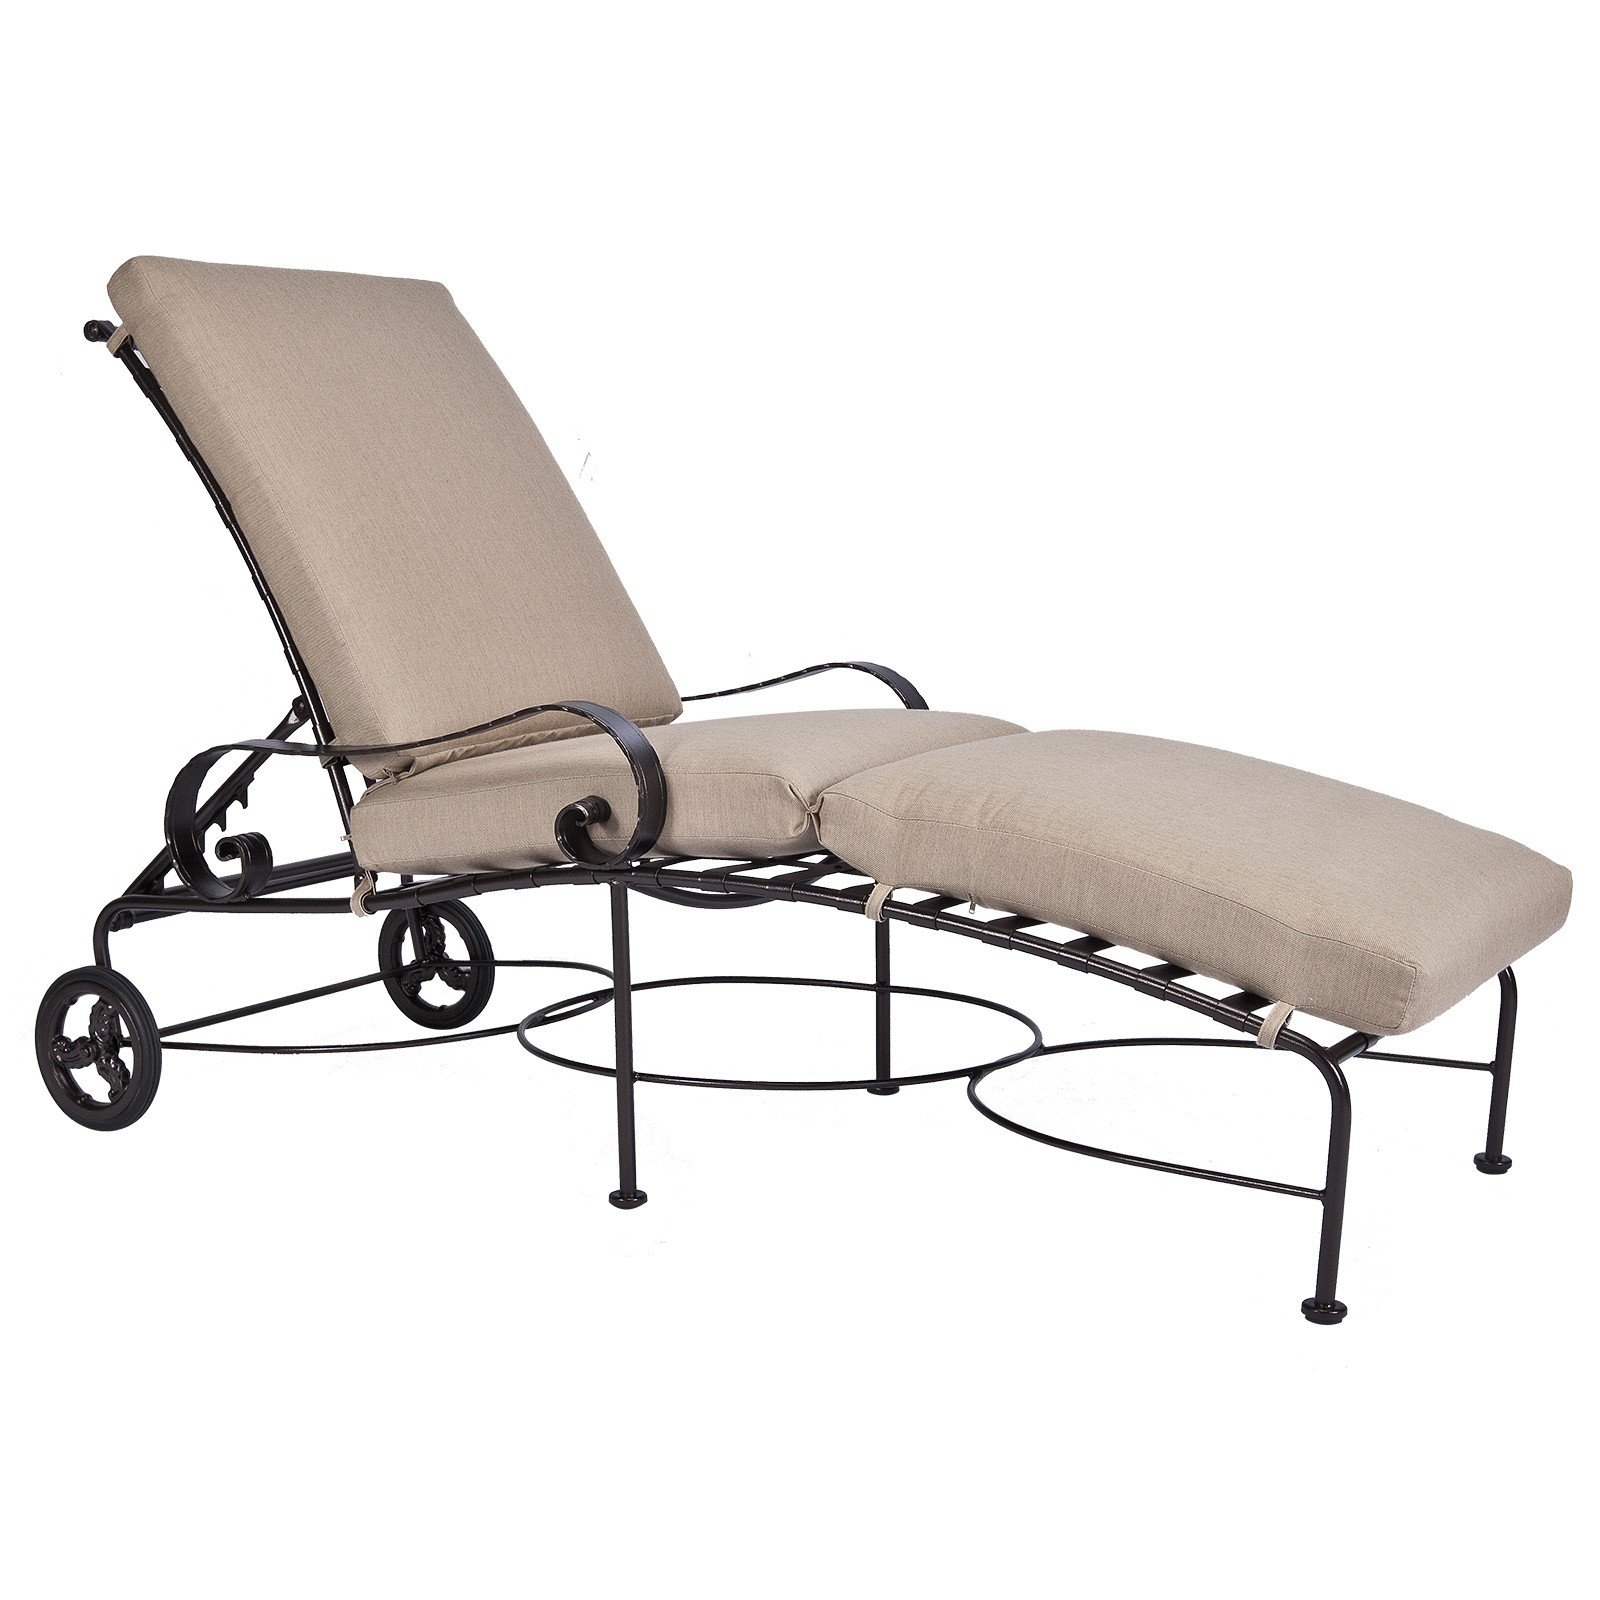 Classico-W Adjustable Chaise